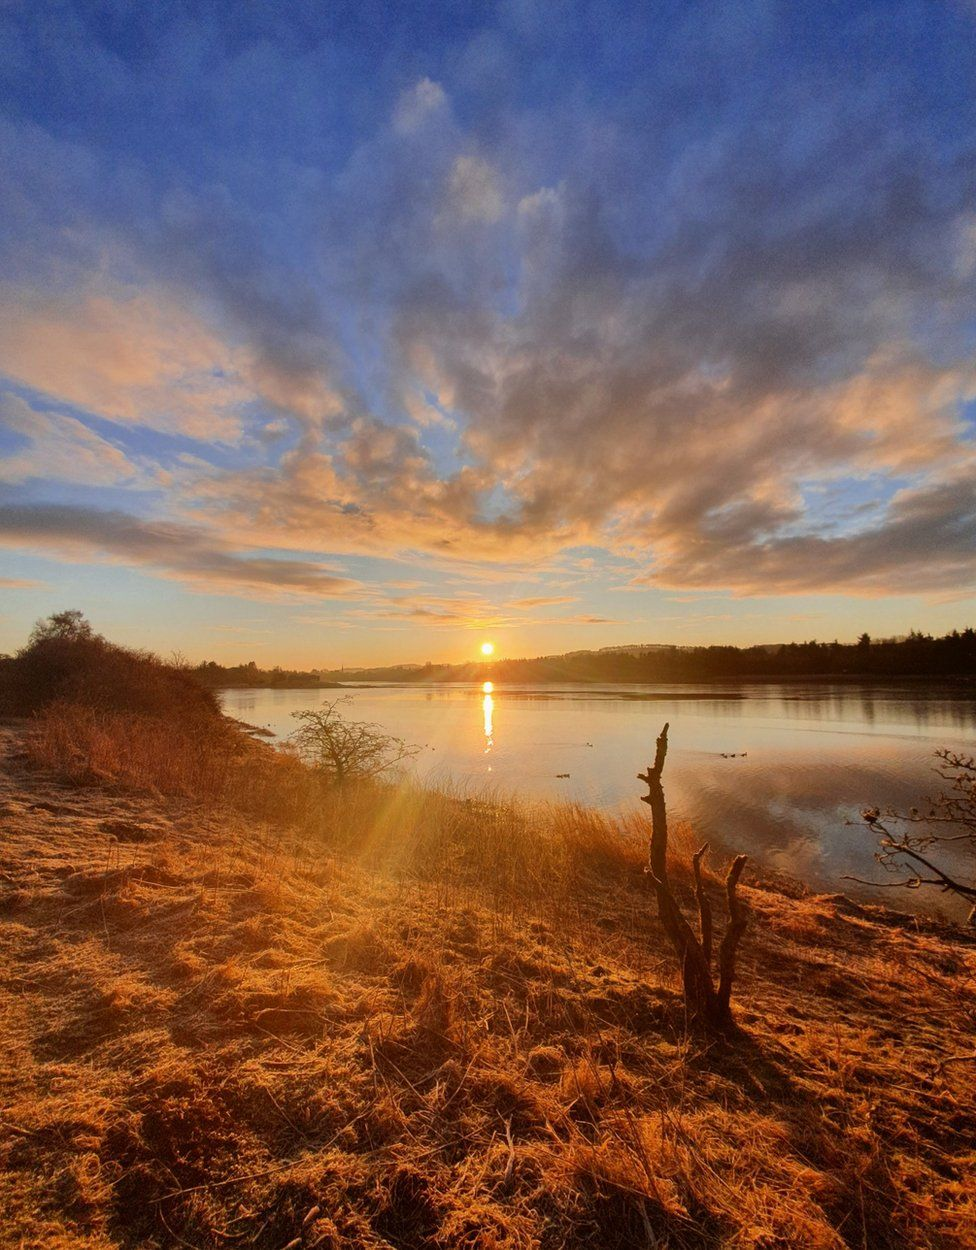 Sunrise at Forfar Loch